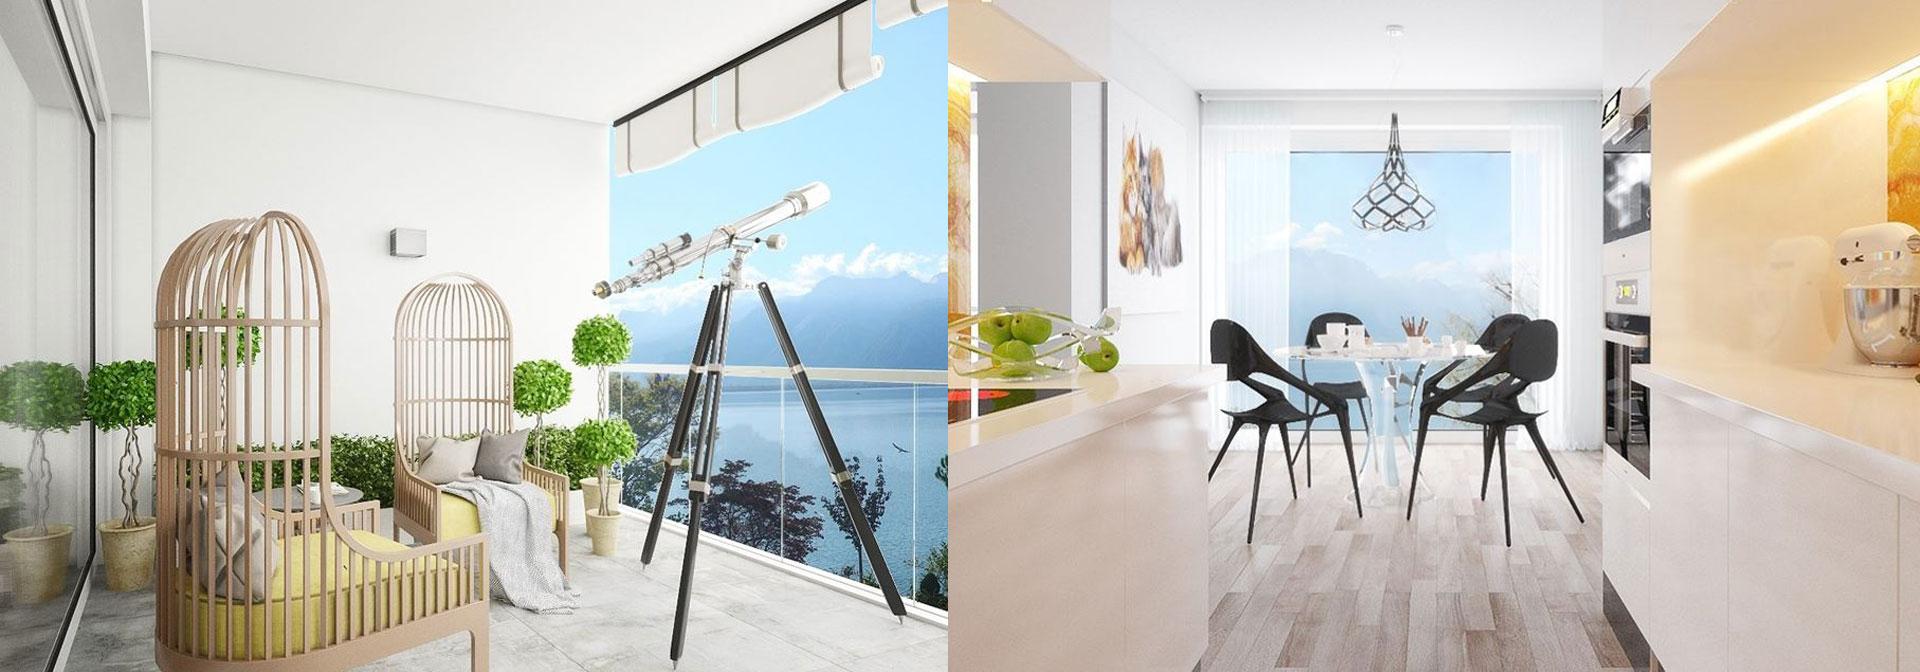 Project Ginevra Svizzera